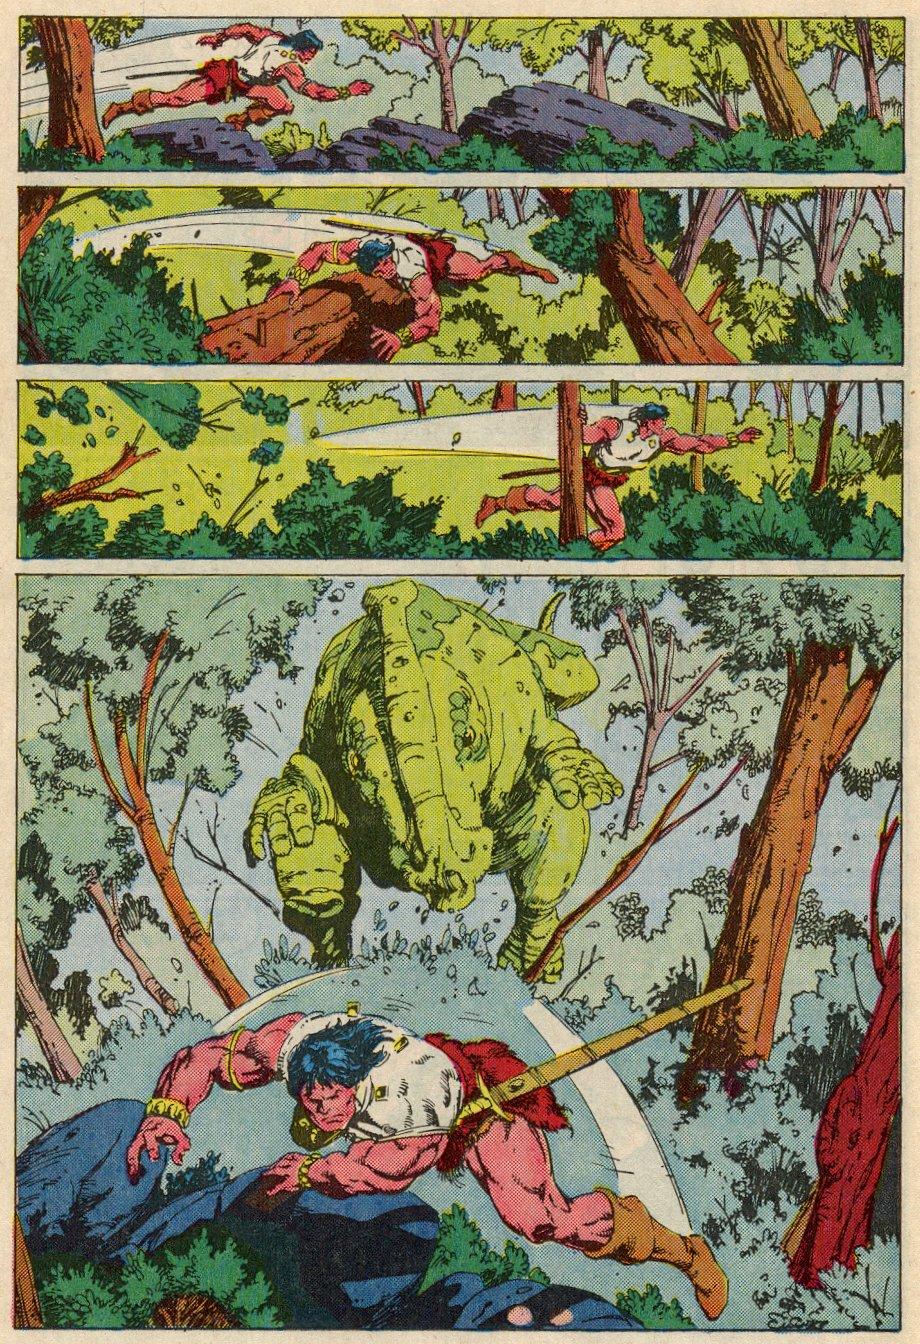 Conan the Barbarian (1970) Issue #197 #209 - English 12